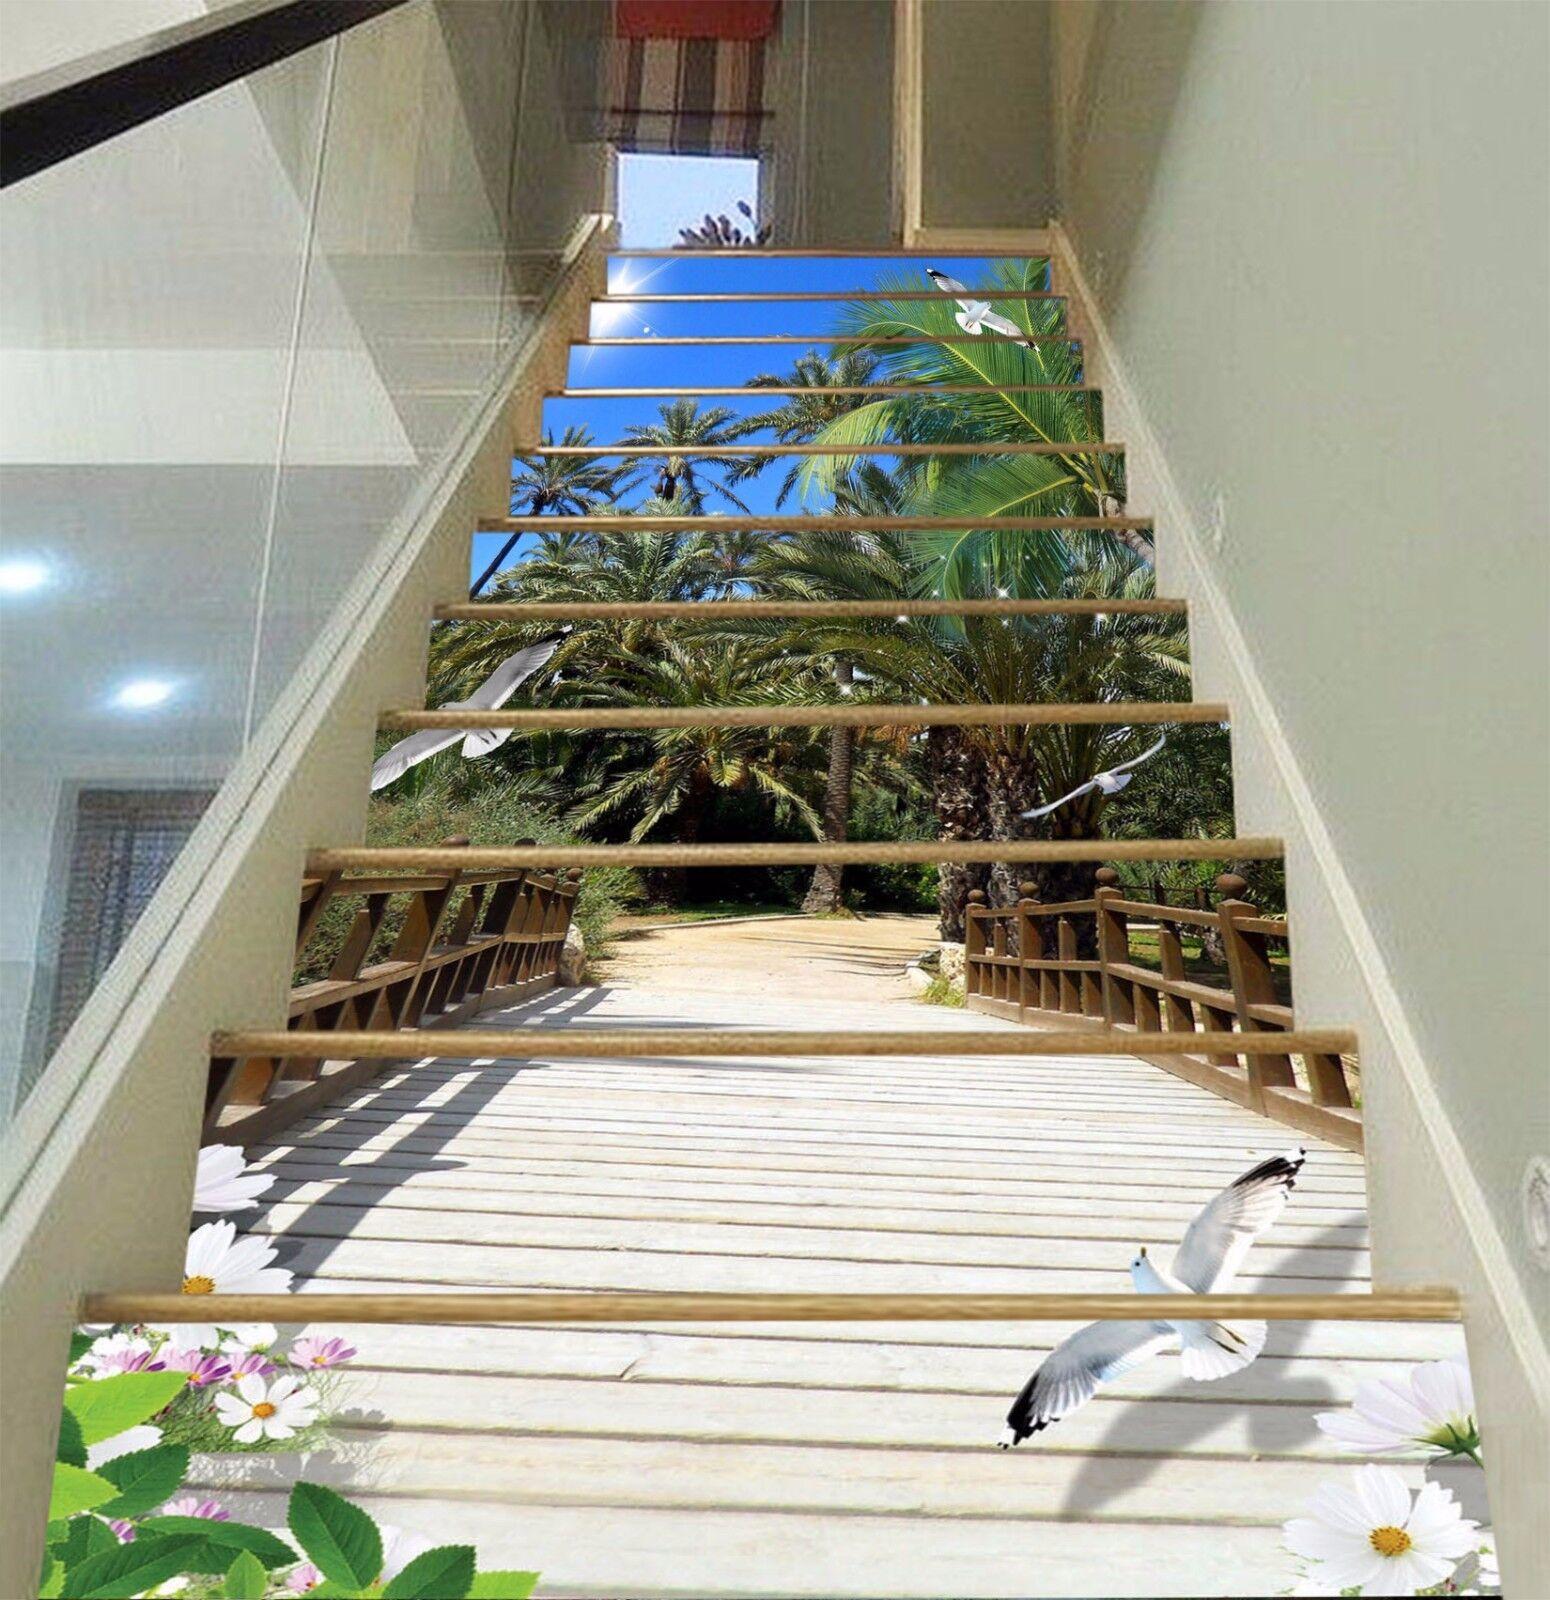 3D Tree Bridge 8033 Stair Risers Decoration Photo Mural Vinyl Decal Wallpaper AU